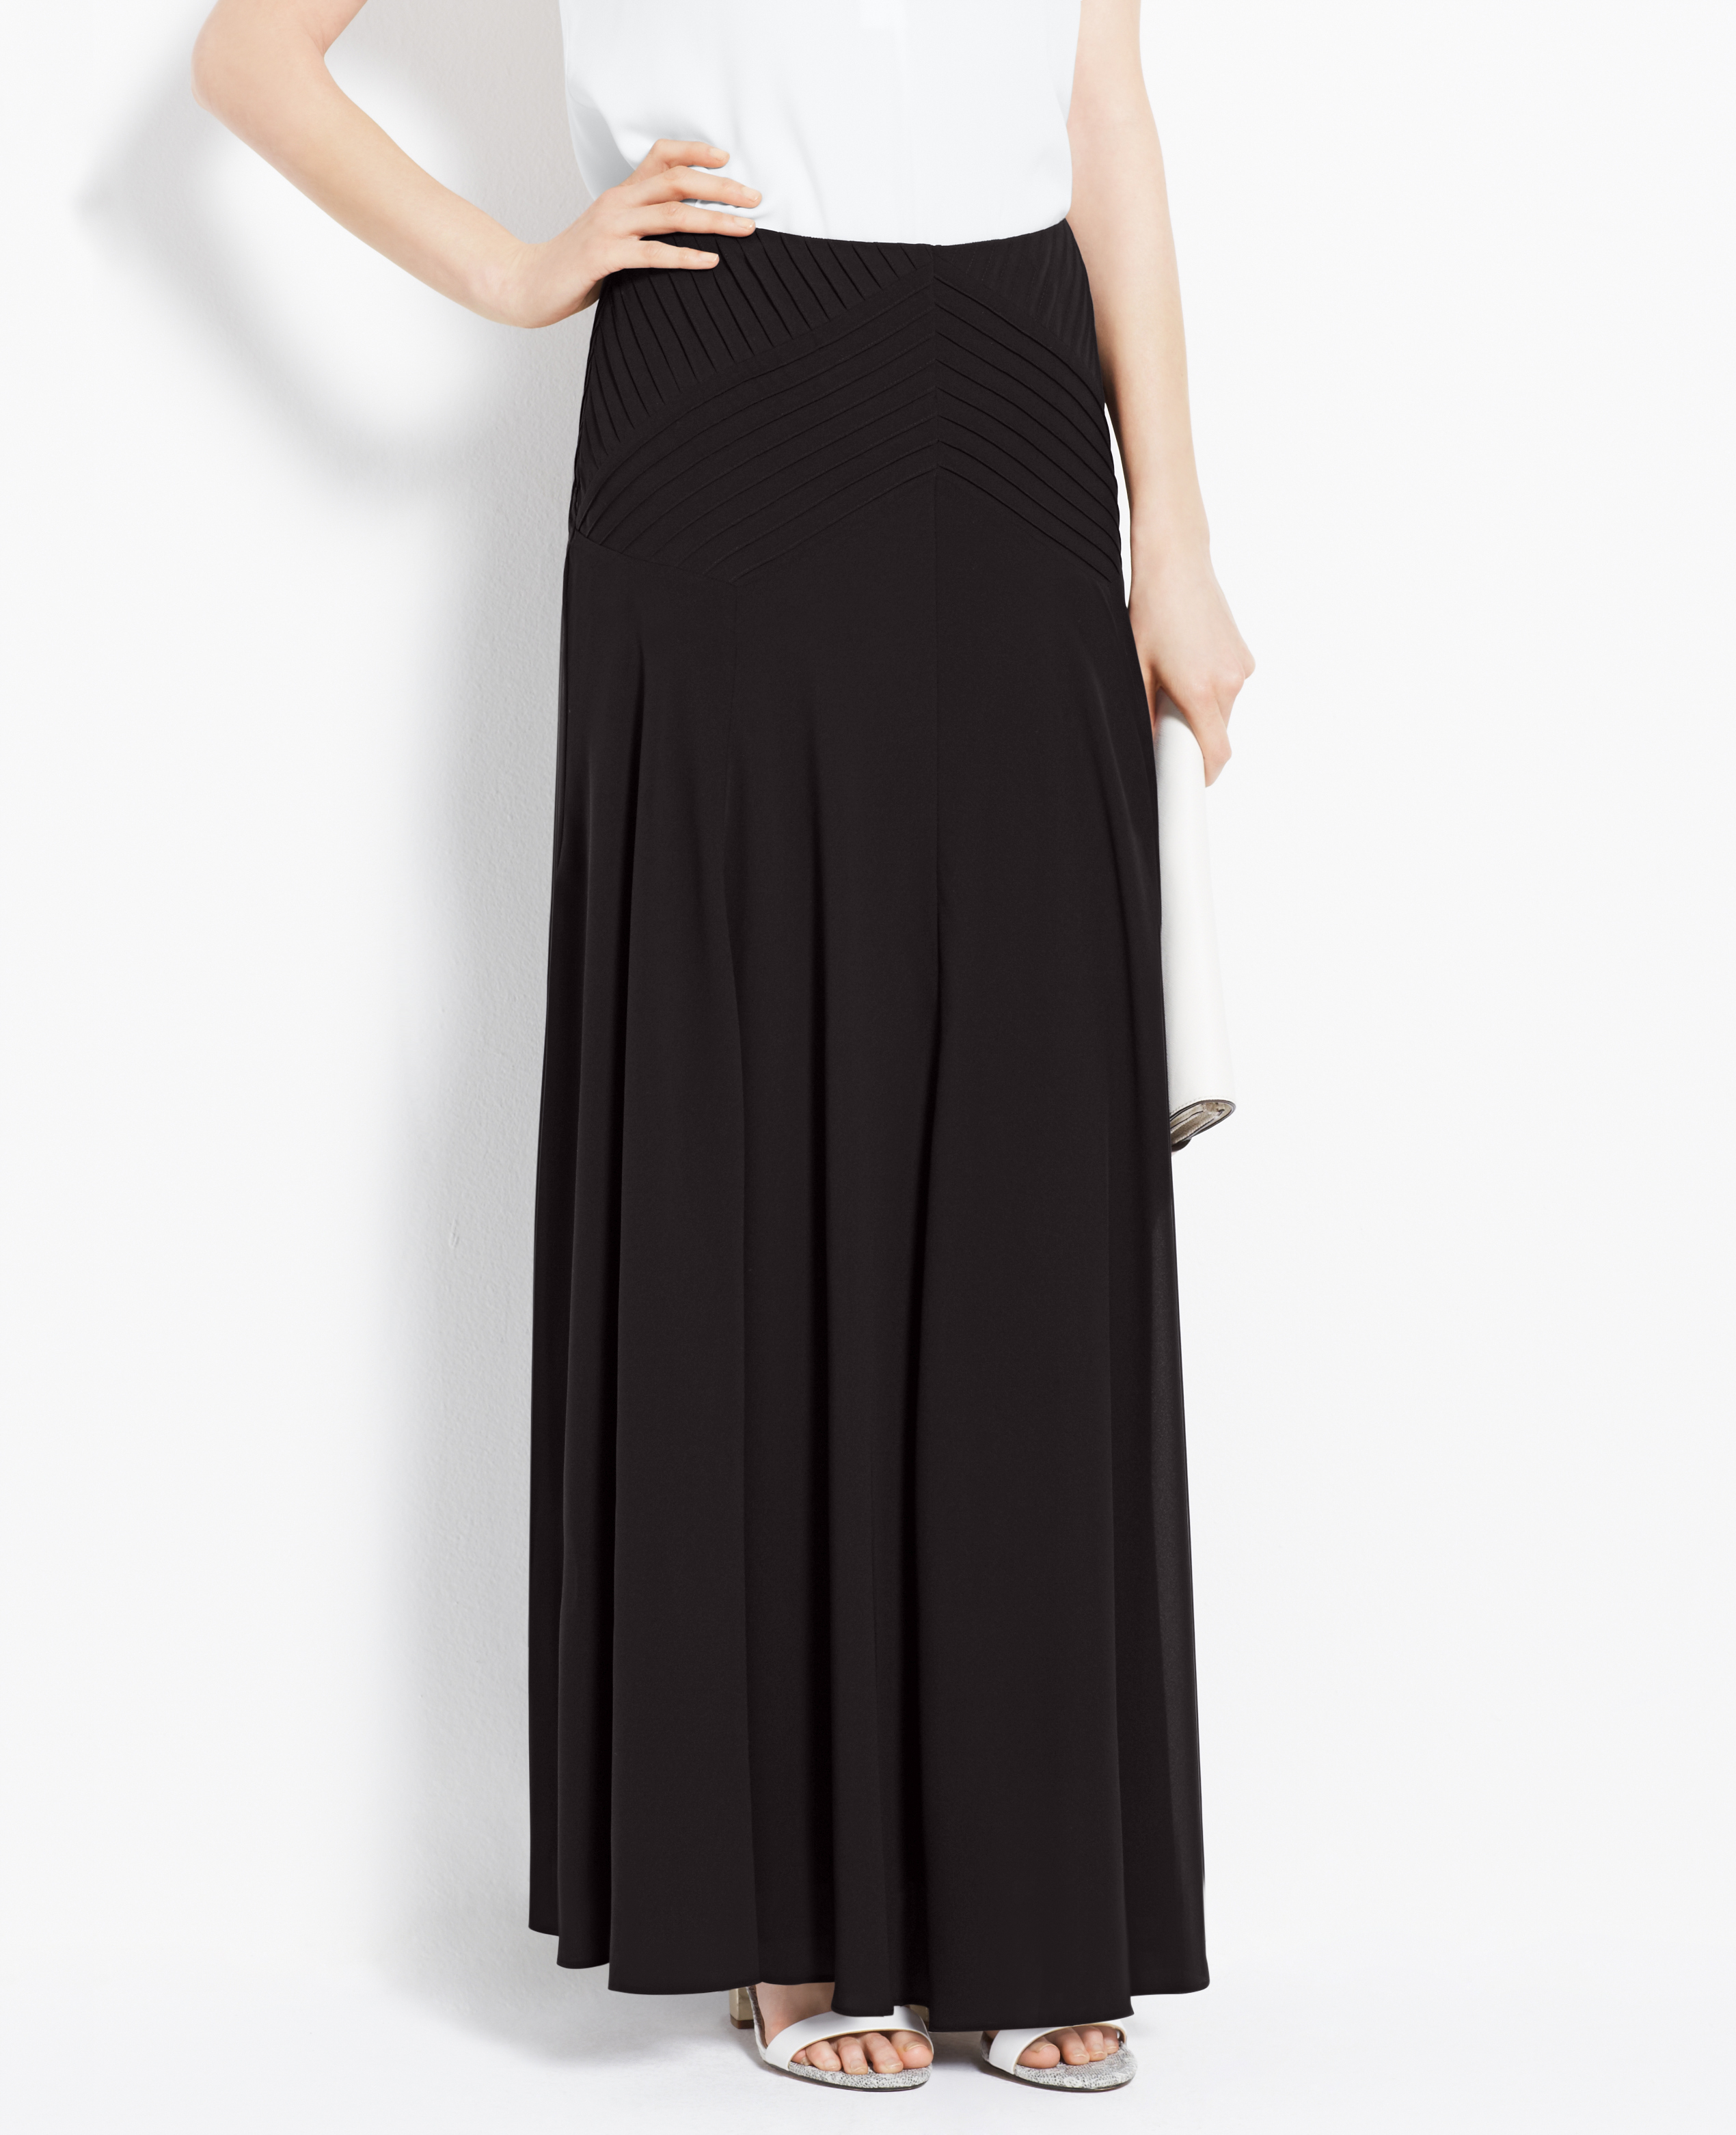 57063c91a3 Petite Black Chiffon Maxi Skirt – DACC